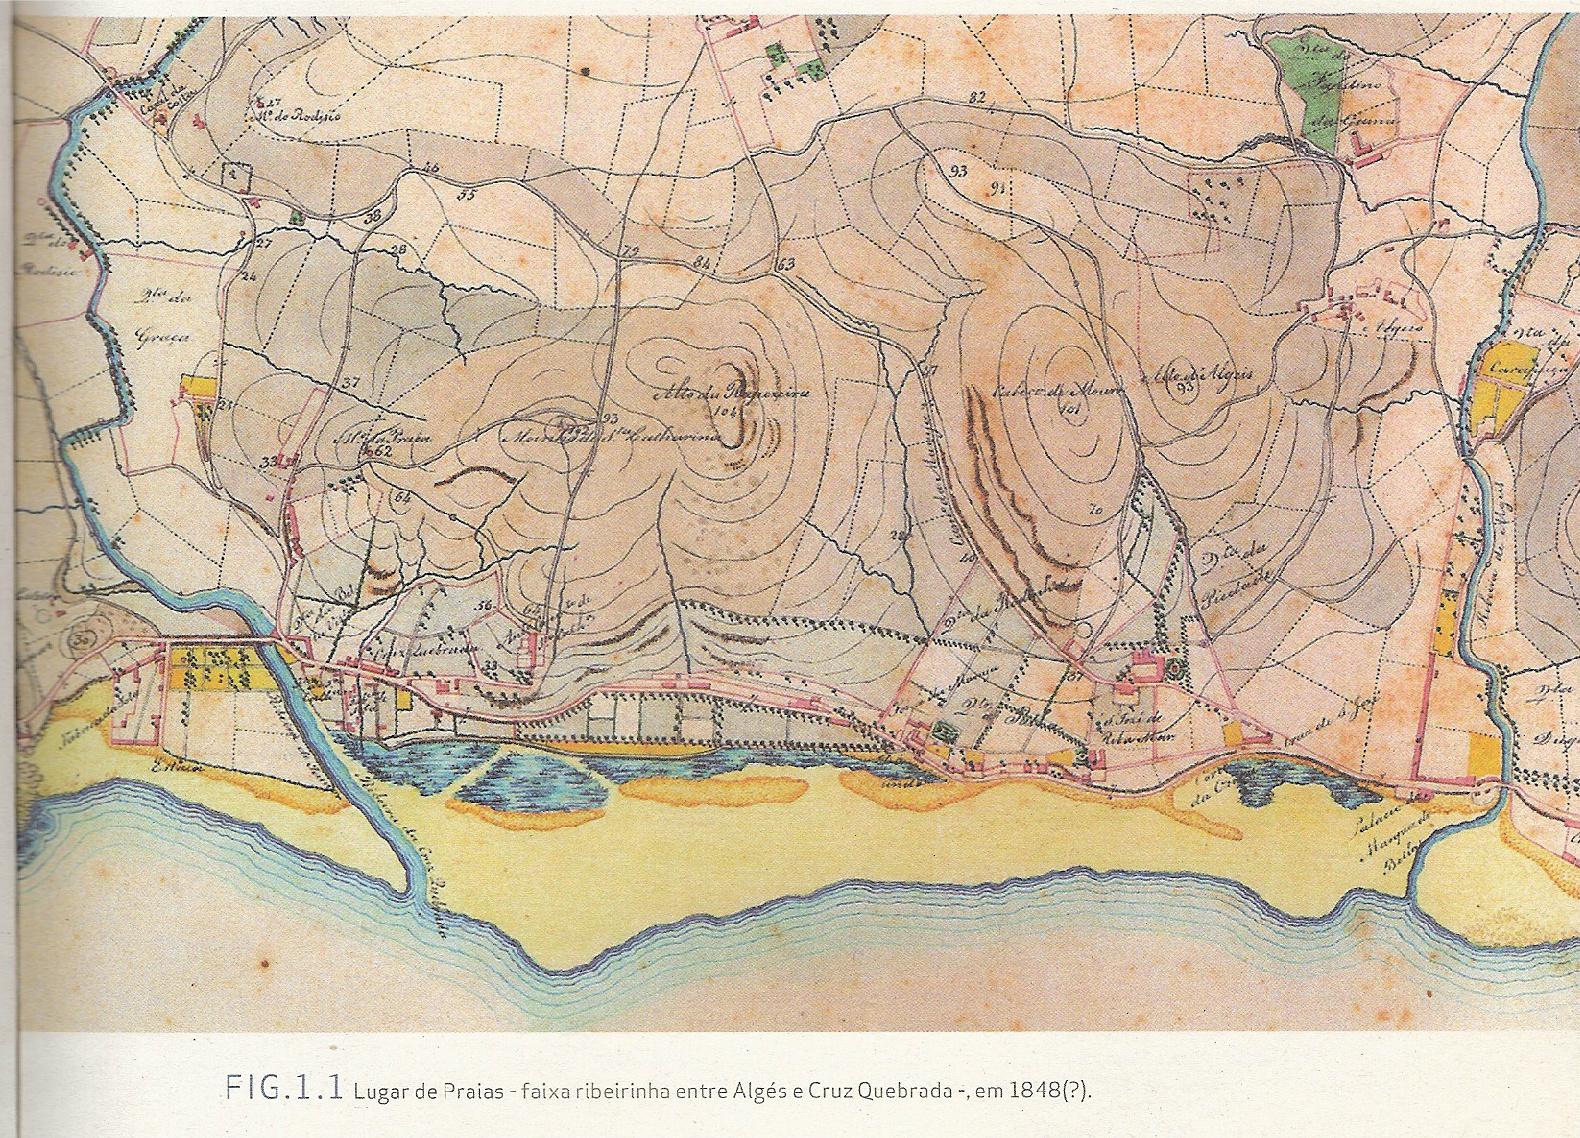 mapa de algés miraflores A Gazeta de Miraflores: A Freguesia de Algés em 1848 mapa de algés miraflores